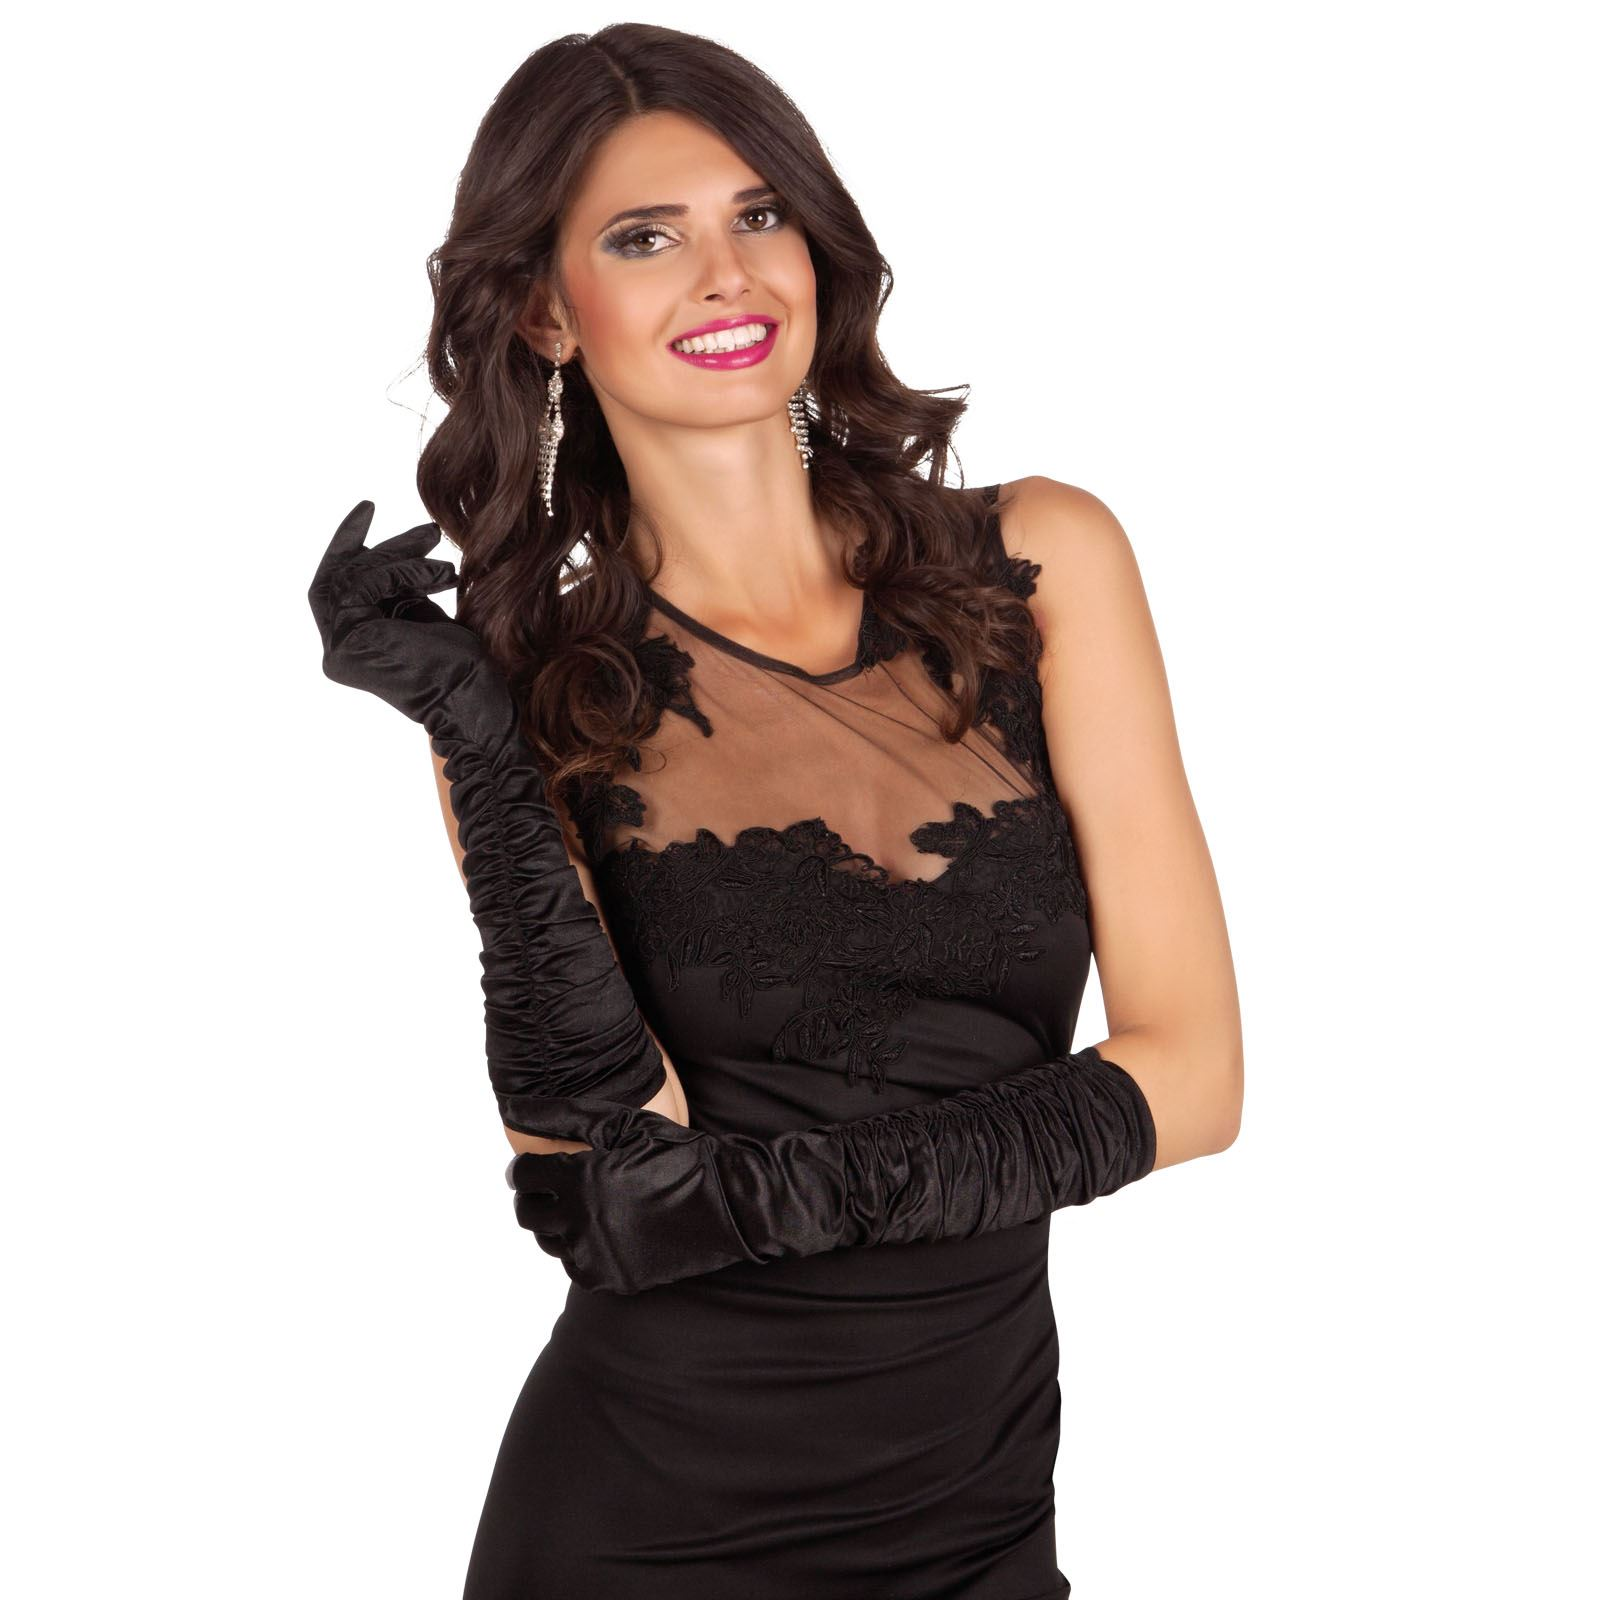 Innovative Child Hollywood Starlet Costume  00212  Fancy Dress Ball